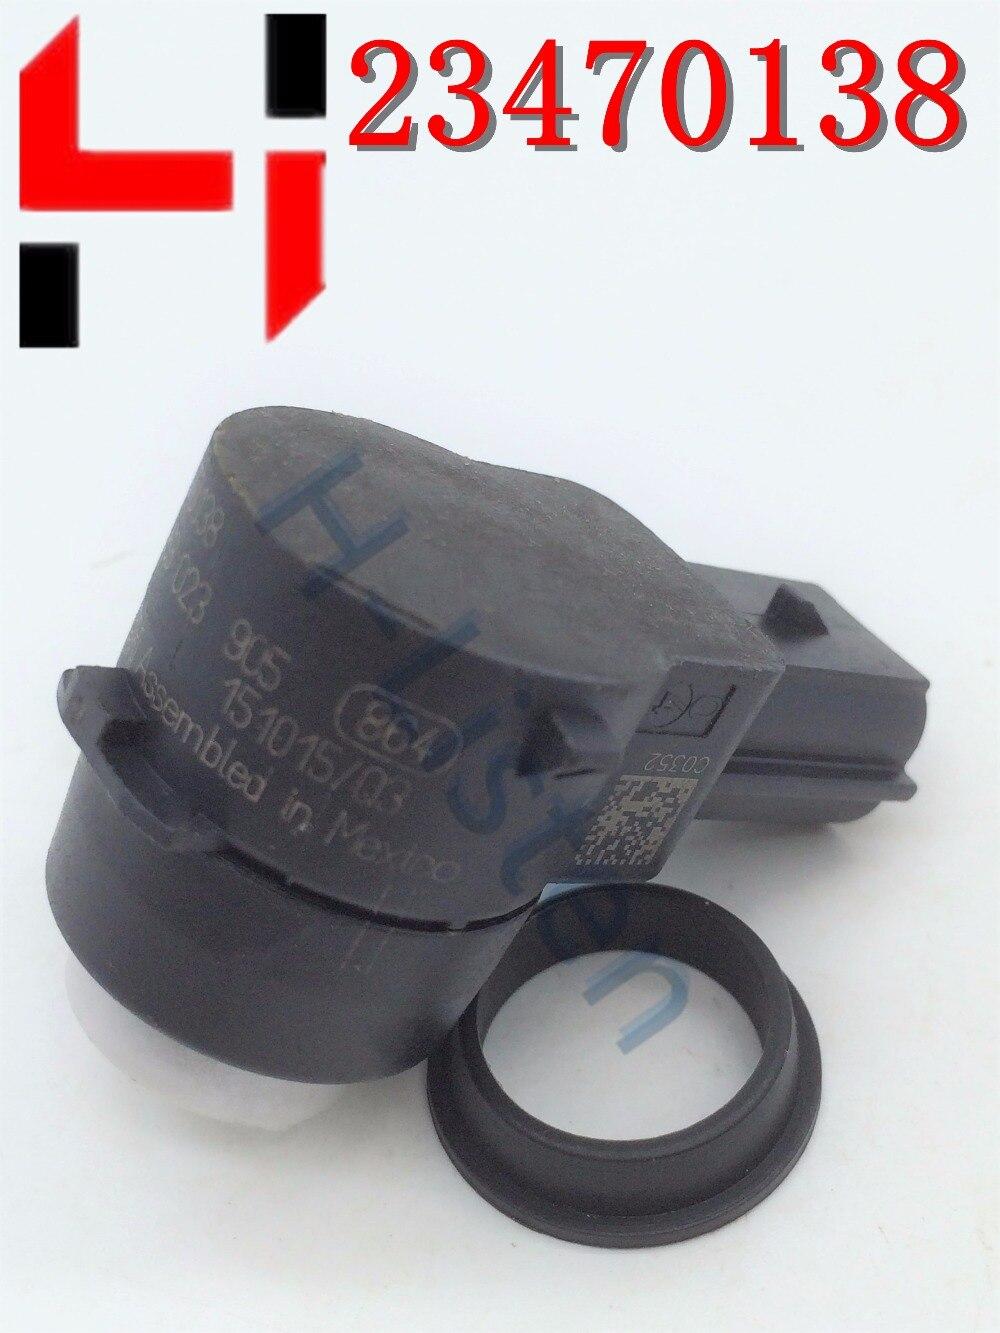 4pcs Parking Distance Control PDC Sensor For Chevrolet Cruze Aveo Orlando Opel Astra J Insignia 23470138 0263023905 Parktronic